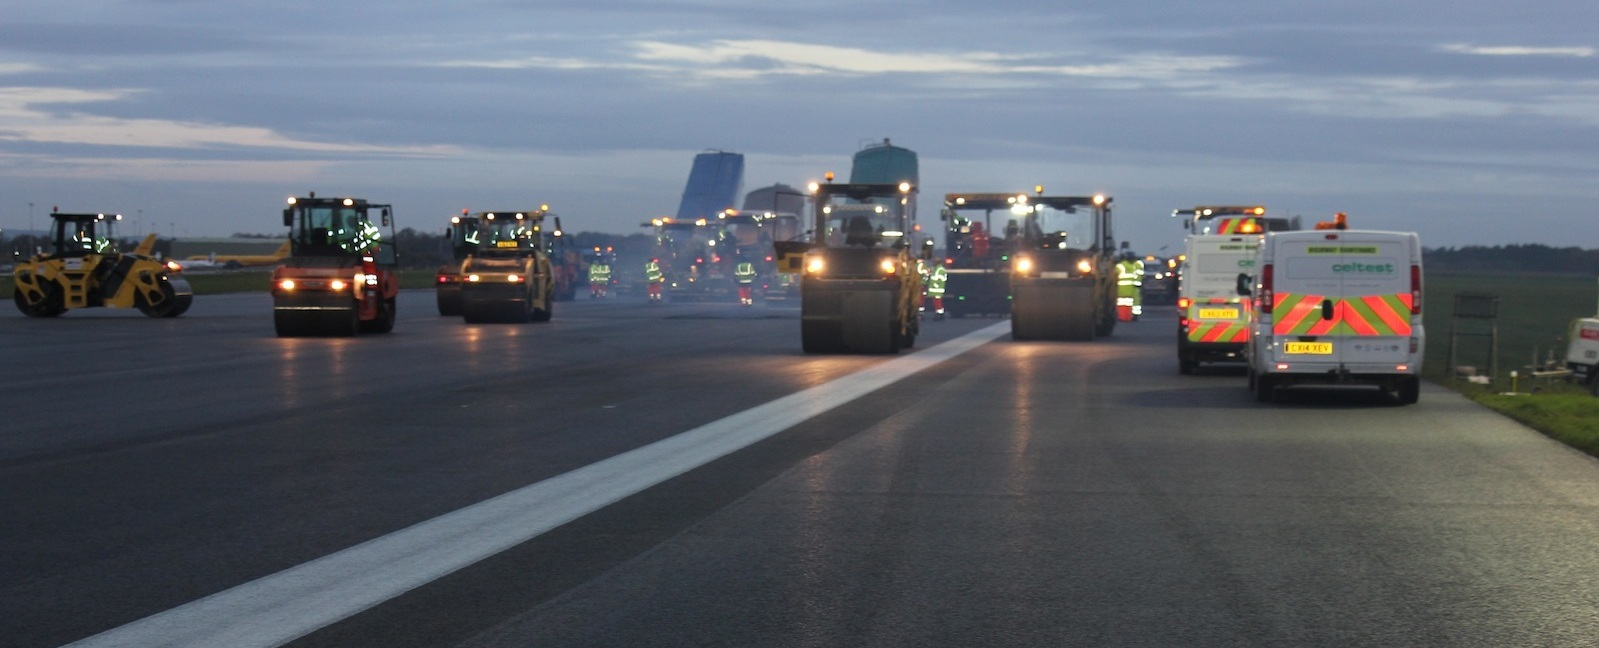 East+Midlands+Airport+Runway